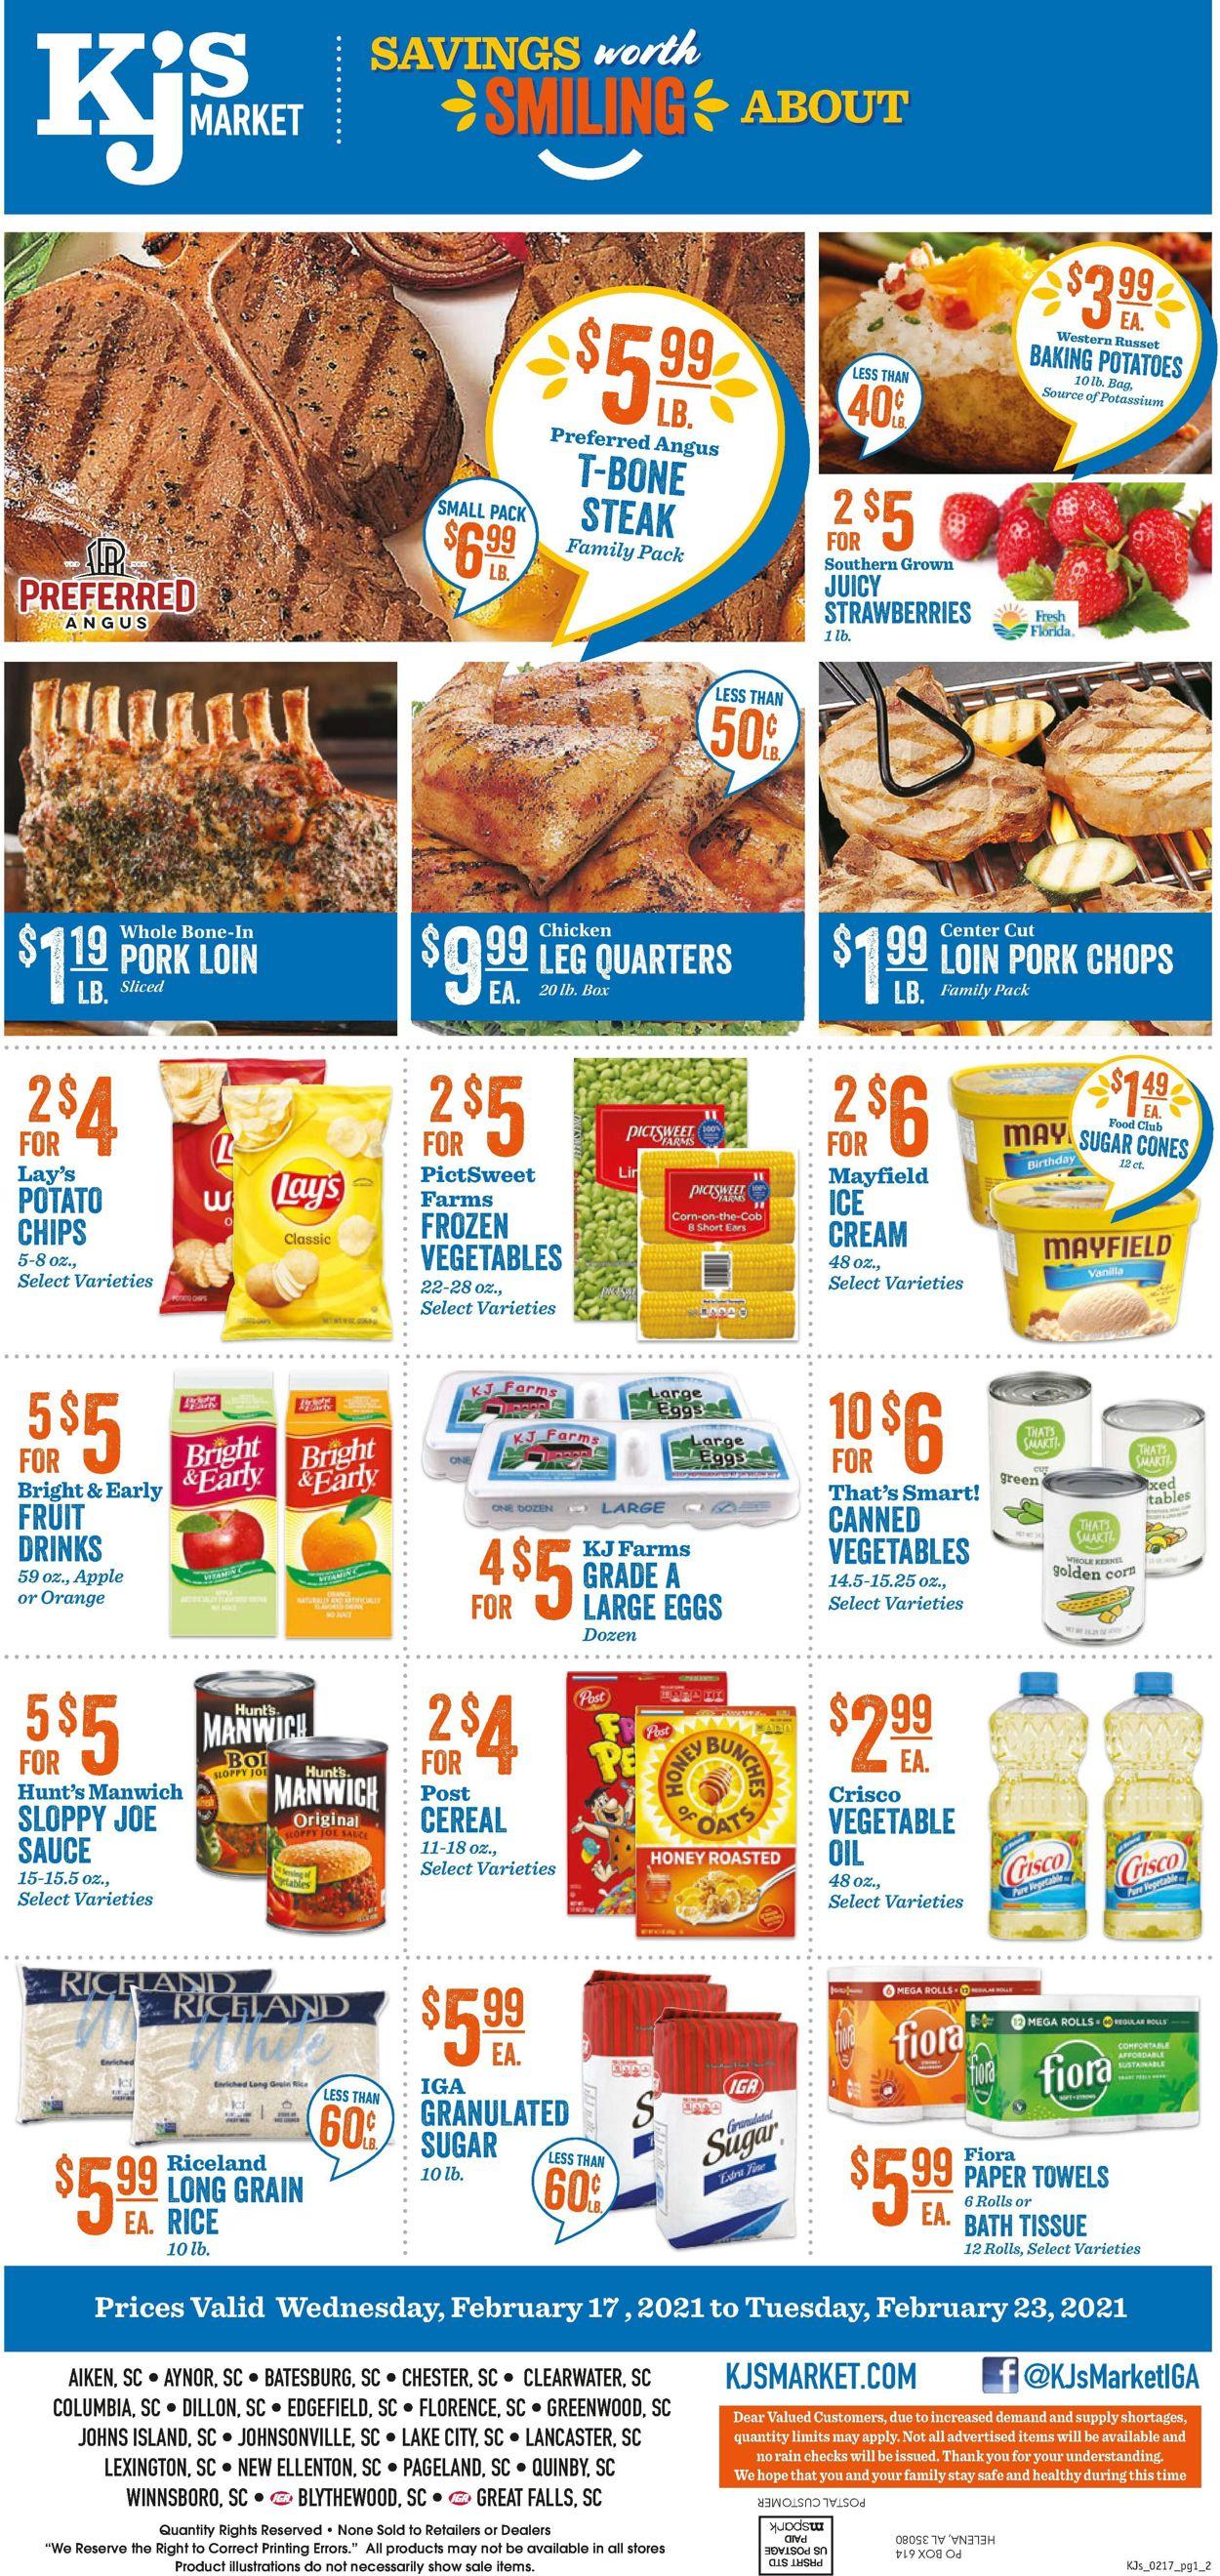 KJ´s Market Weekly Ad Circular - valid 02/17-02/23/2021